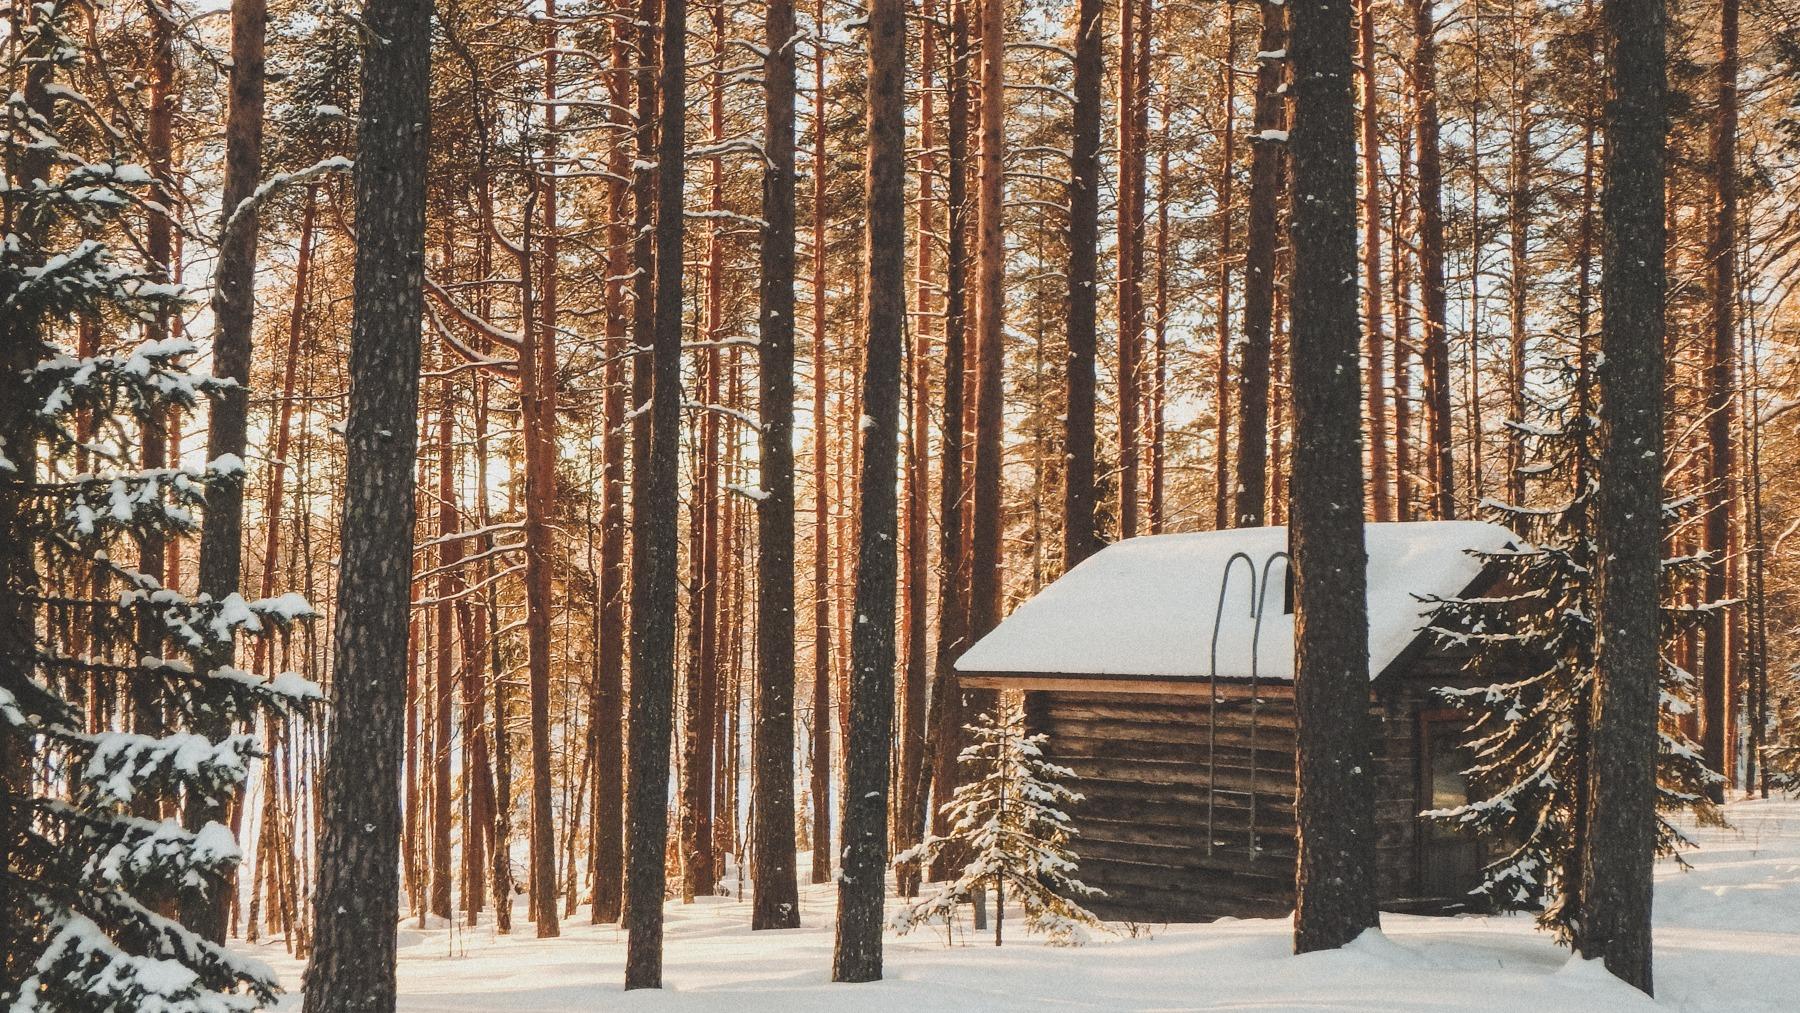 SCHLITTENTOUR: Karelien